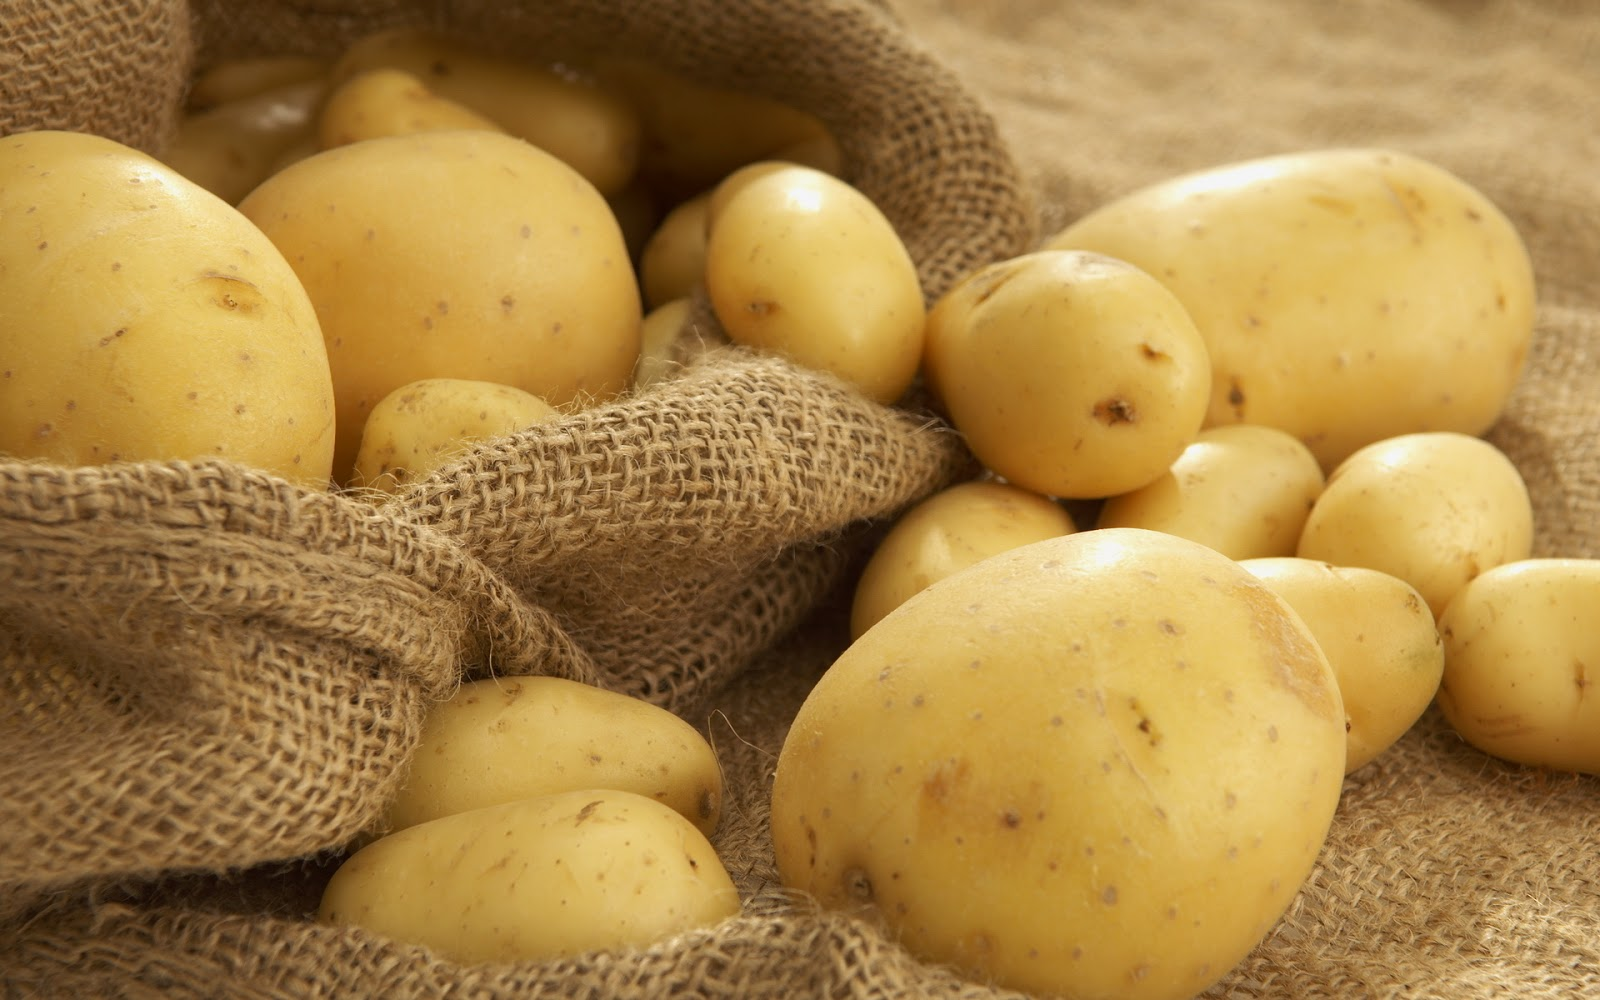 patatesli yumurta, patates kızartması, patates salatası